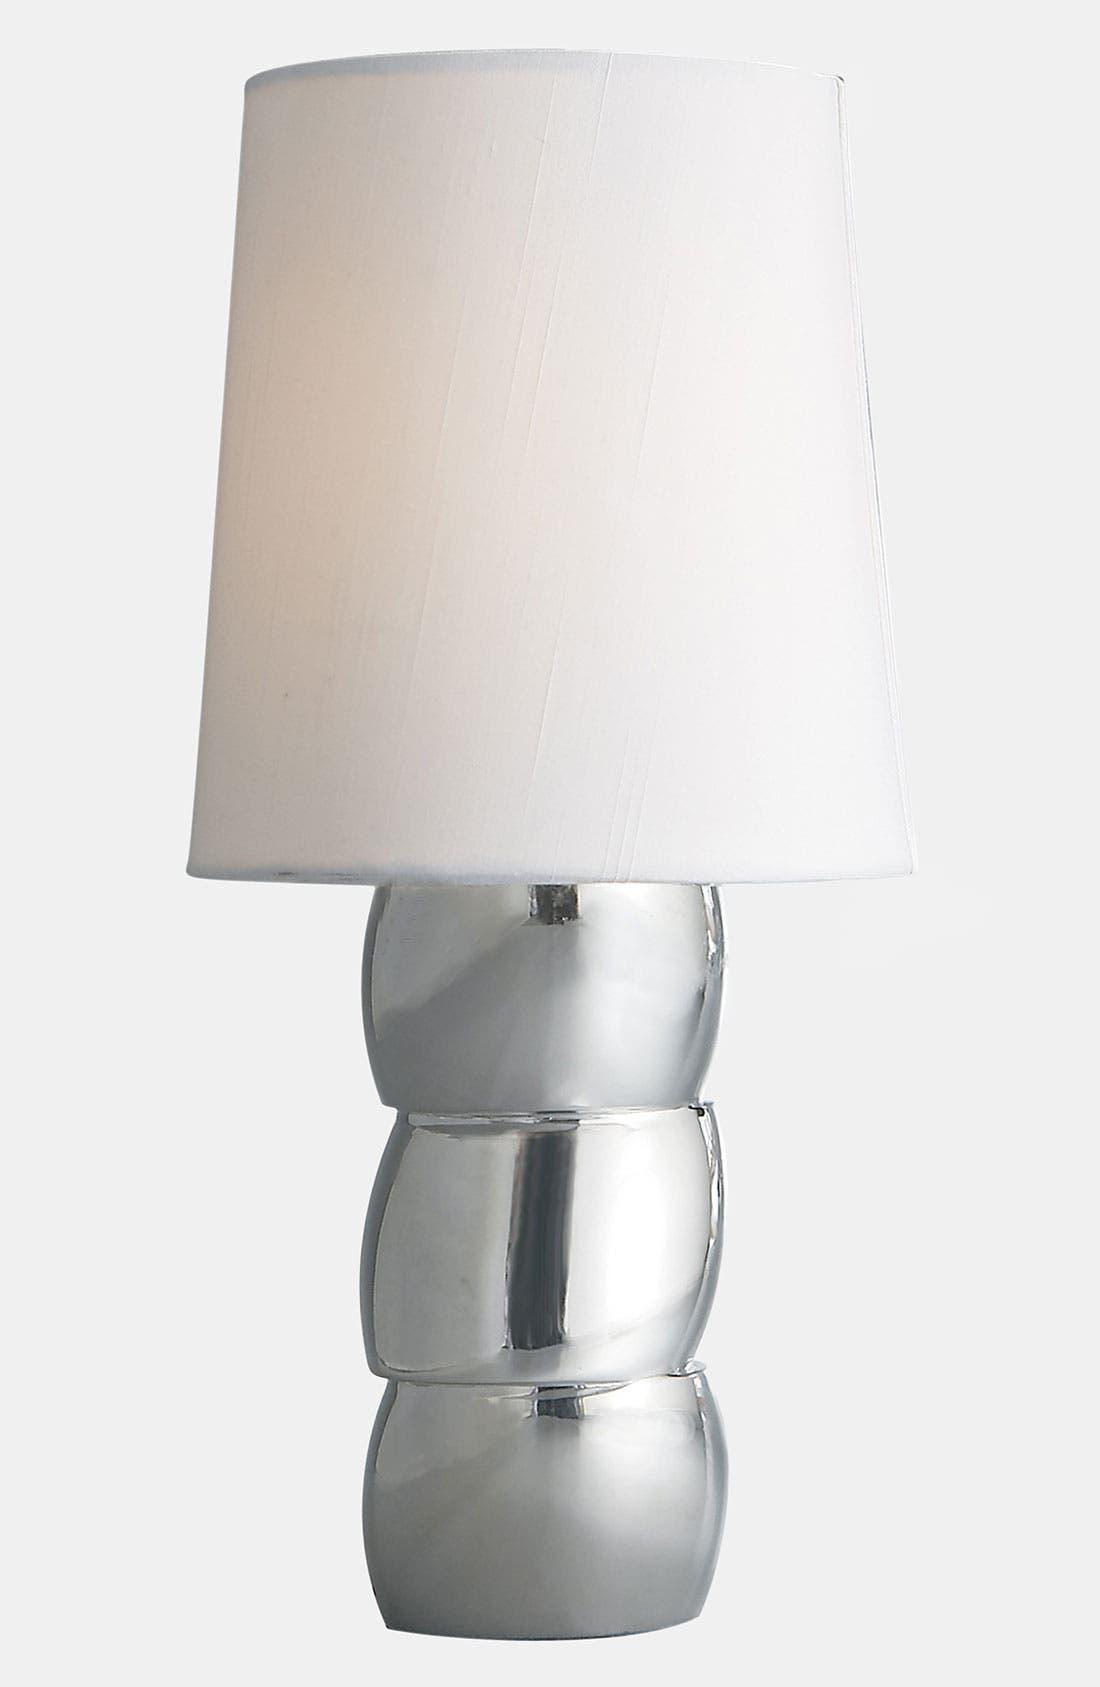 Alternate Image 1 Selected - Nambé 'Libra' Accent Lamp